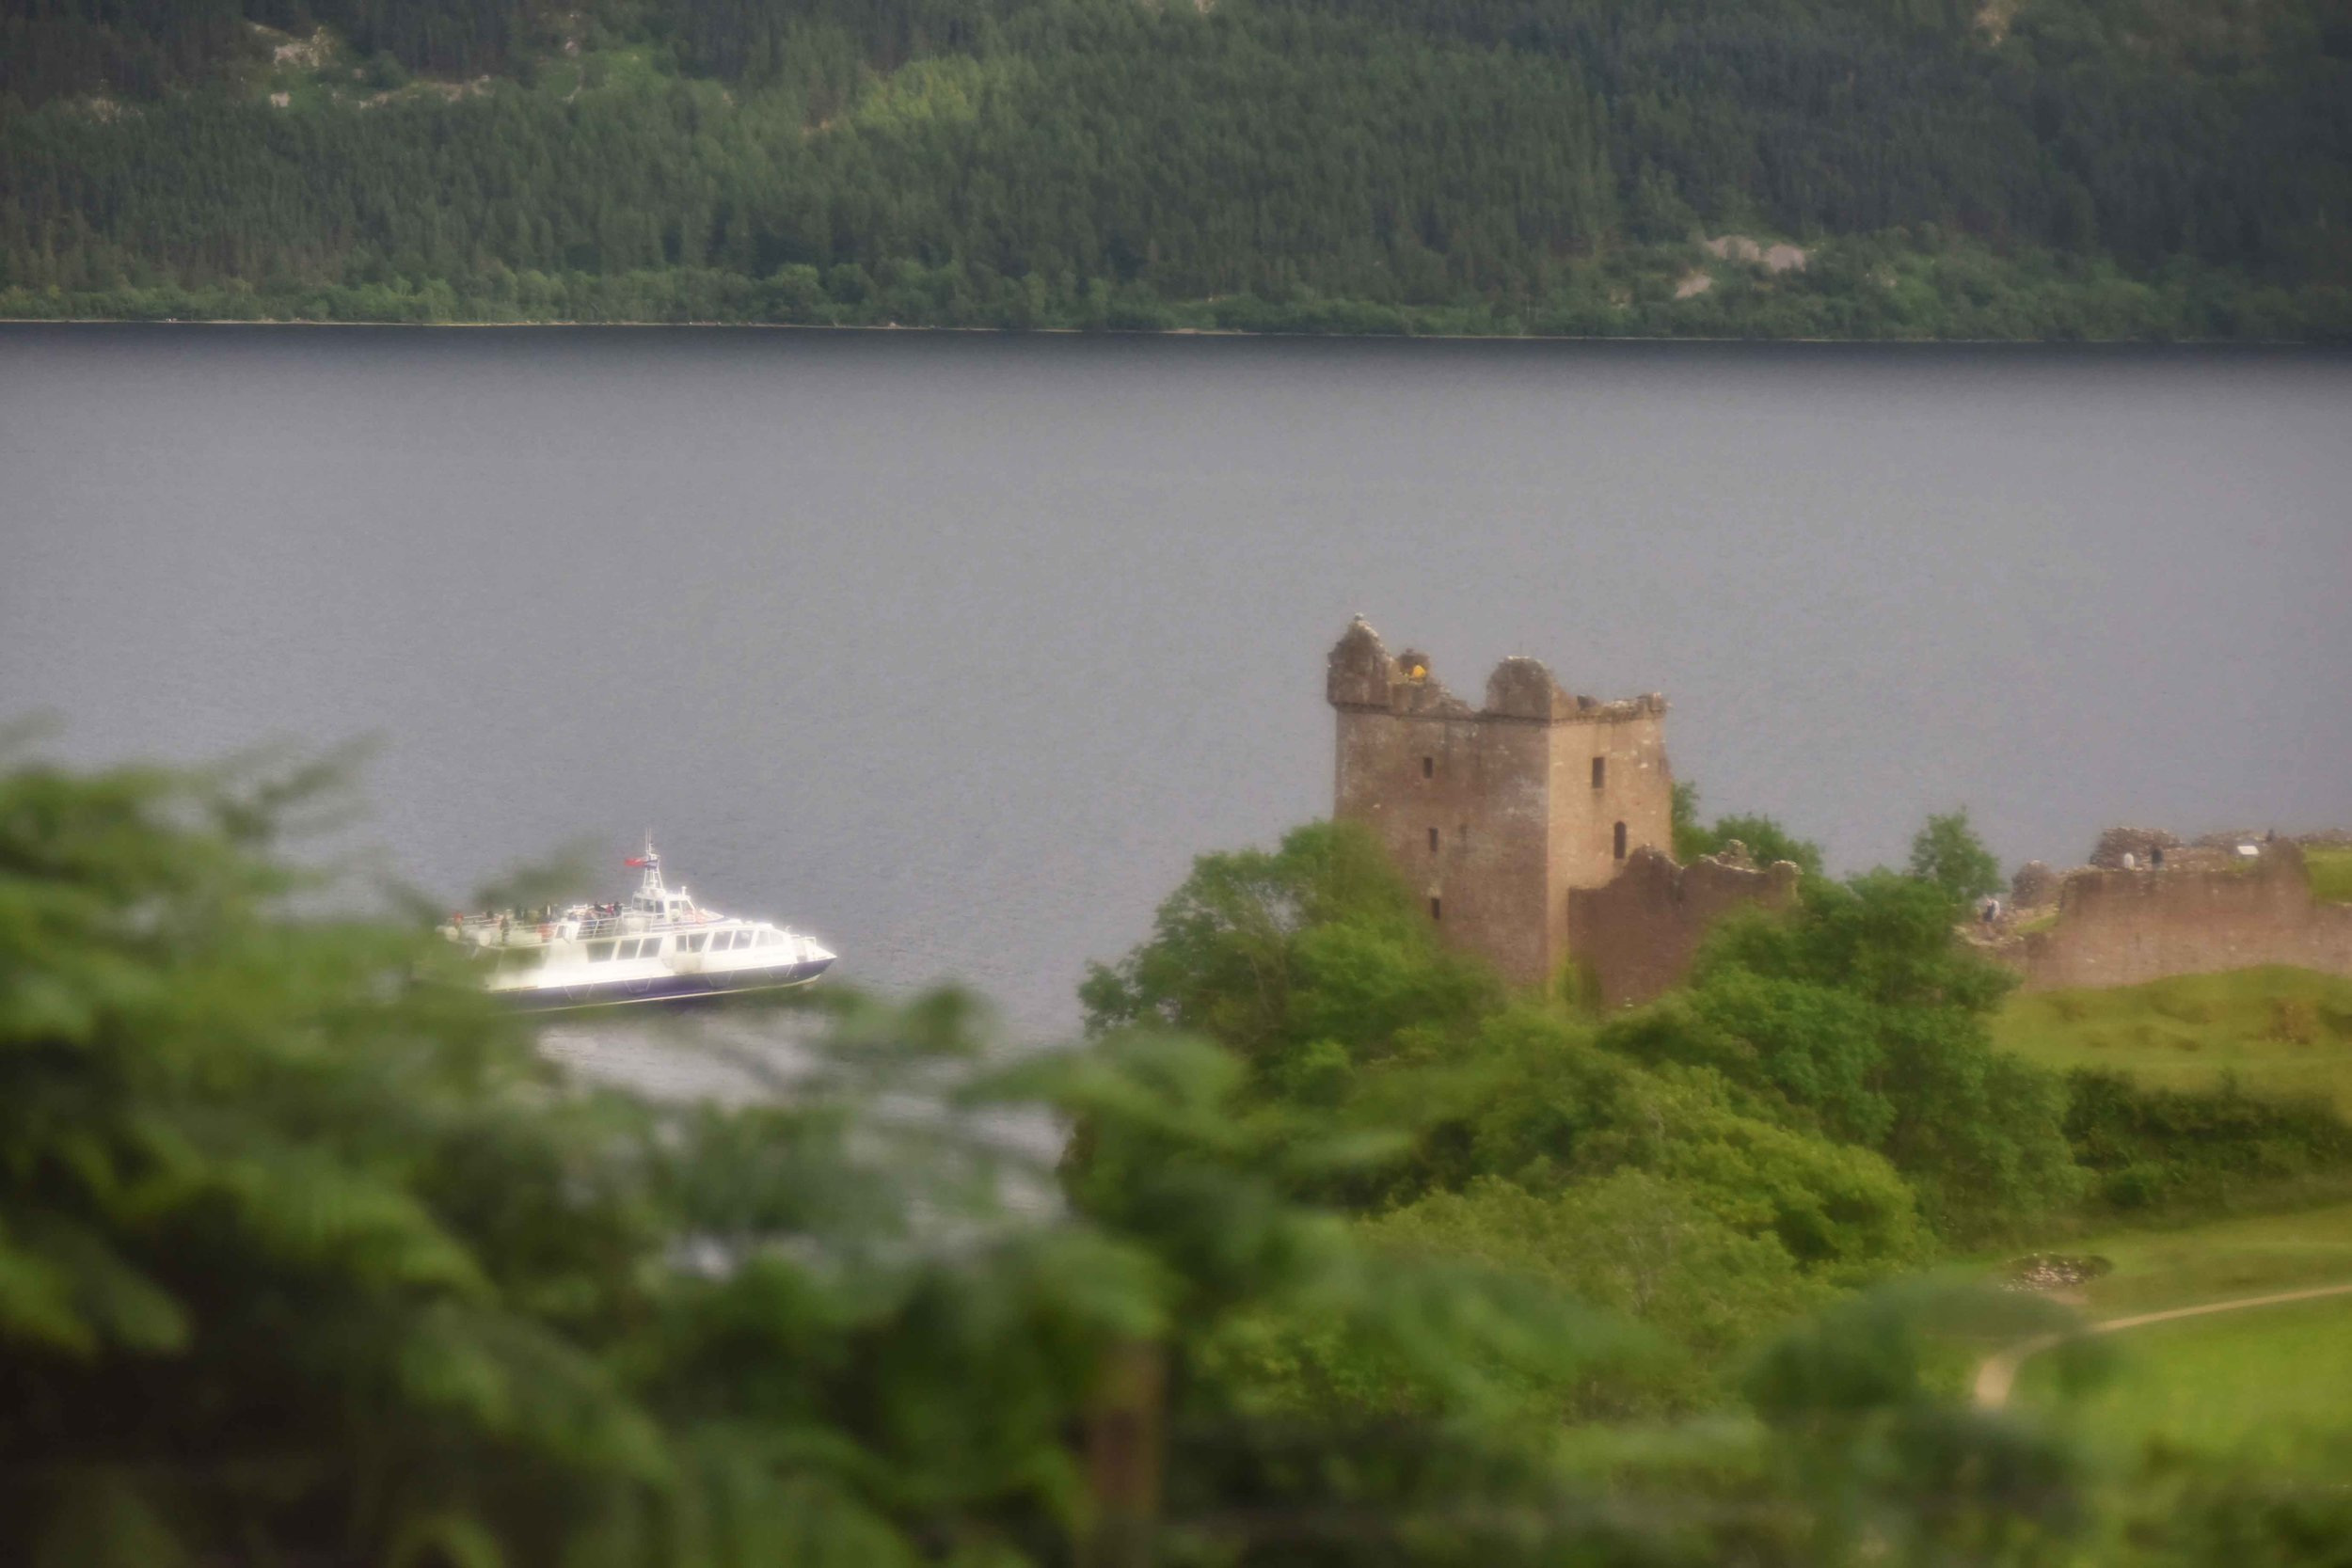 Urquhart Castle, Loch Ness, Scotland. Image©sourcingstyle.com